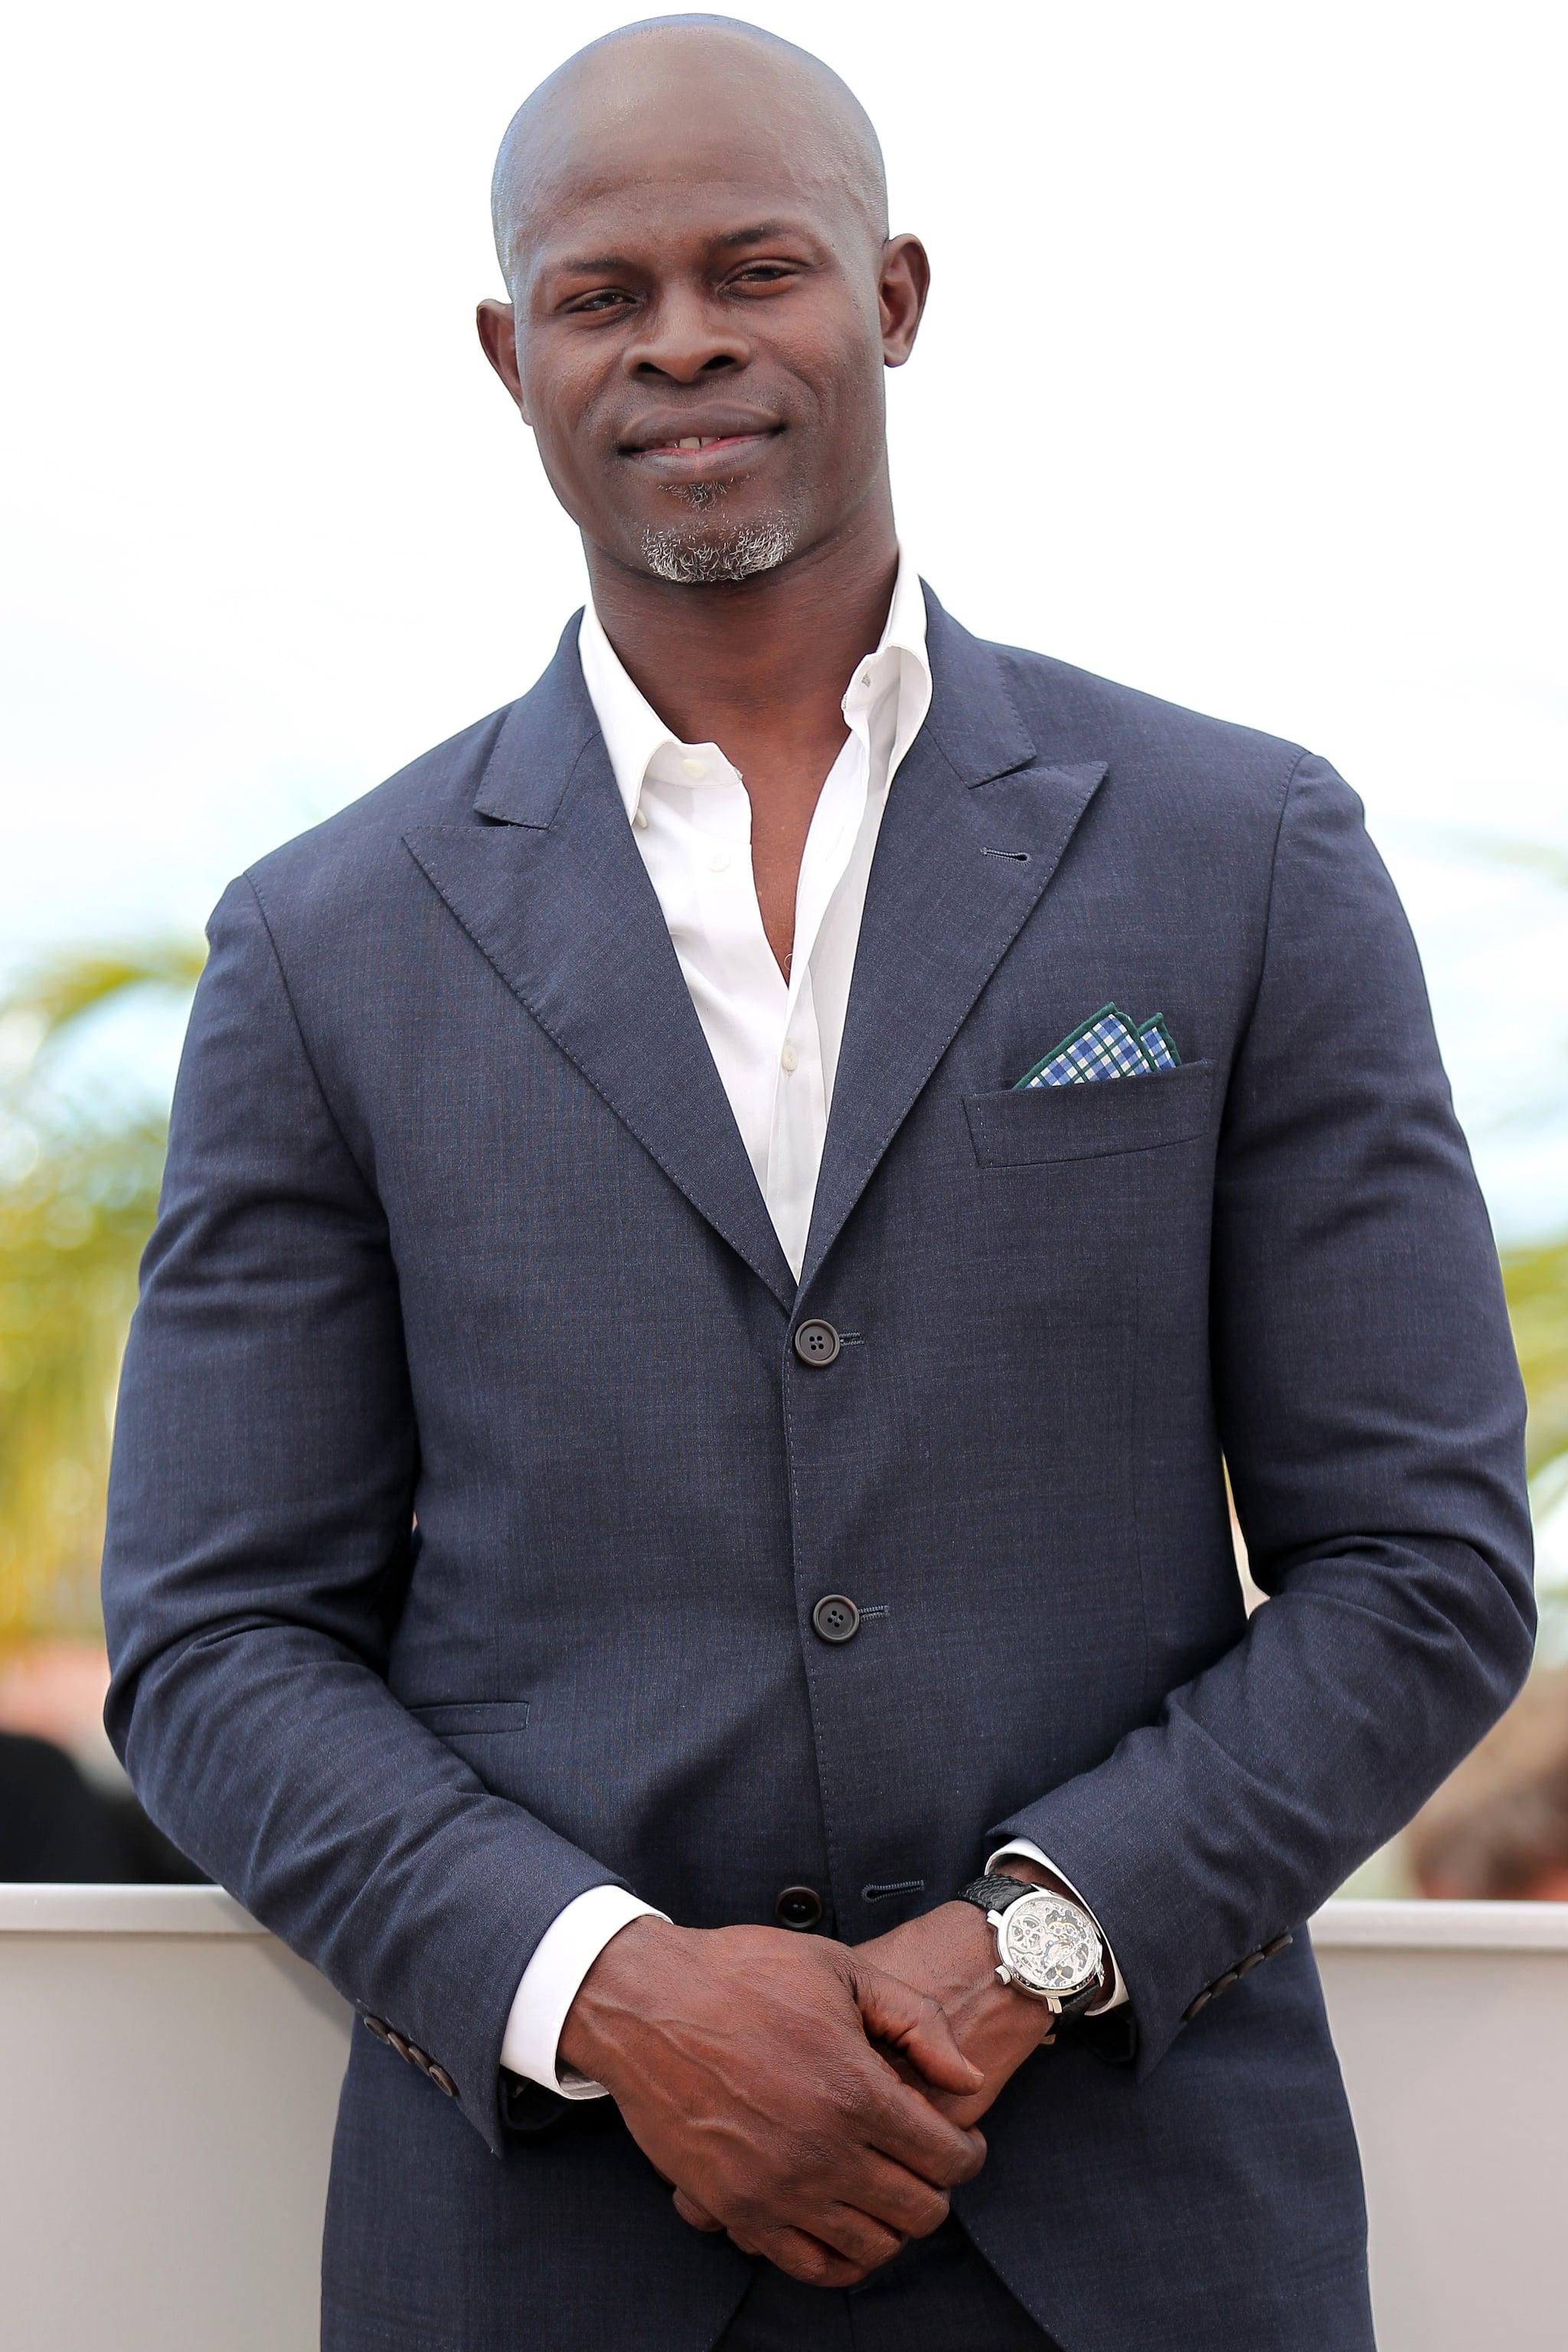 Djimon Hounsou joined Tarzan as Chief Mbonga. Alexander Skarsgard and Margot Robbie are also starring.